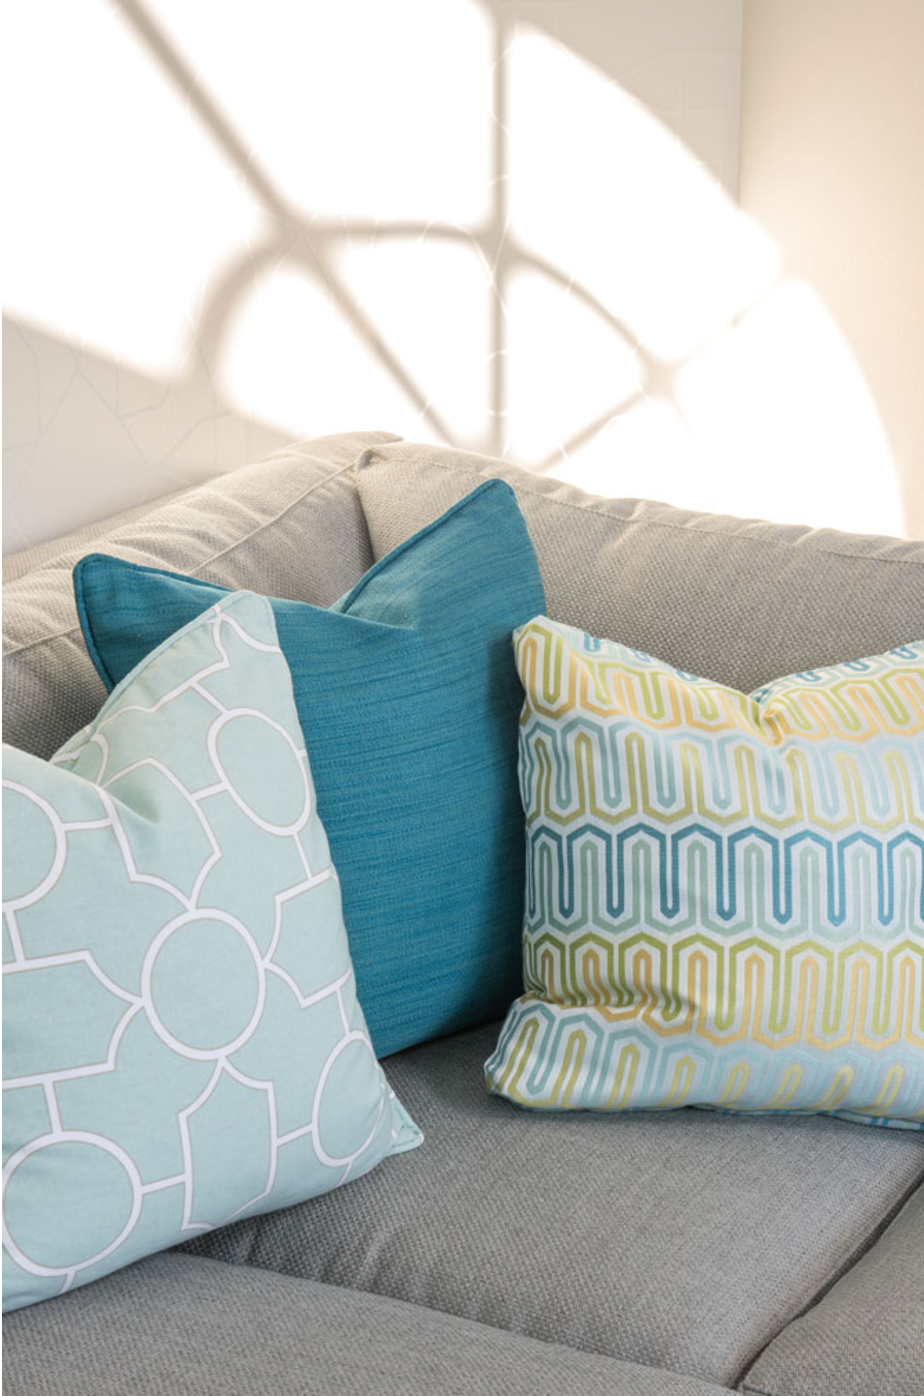 How to Mix Patterns Like a Boss | Interior Design Dallas | Barbara Gilbert Interiors